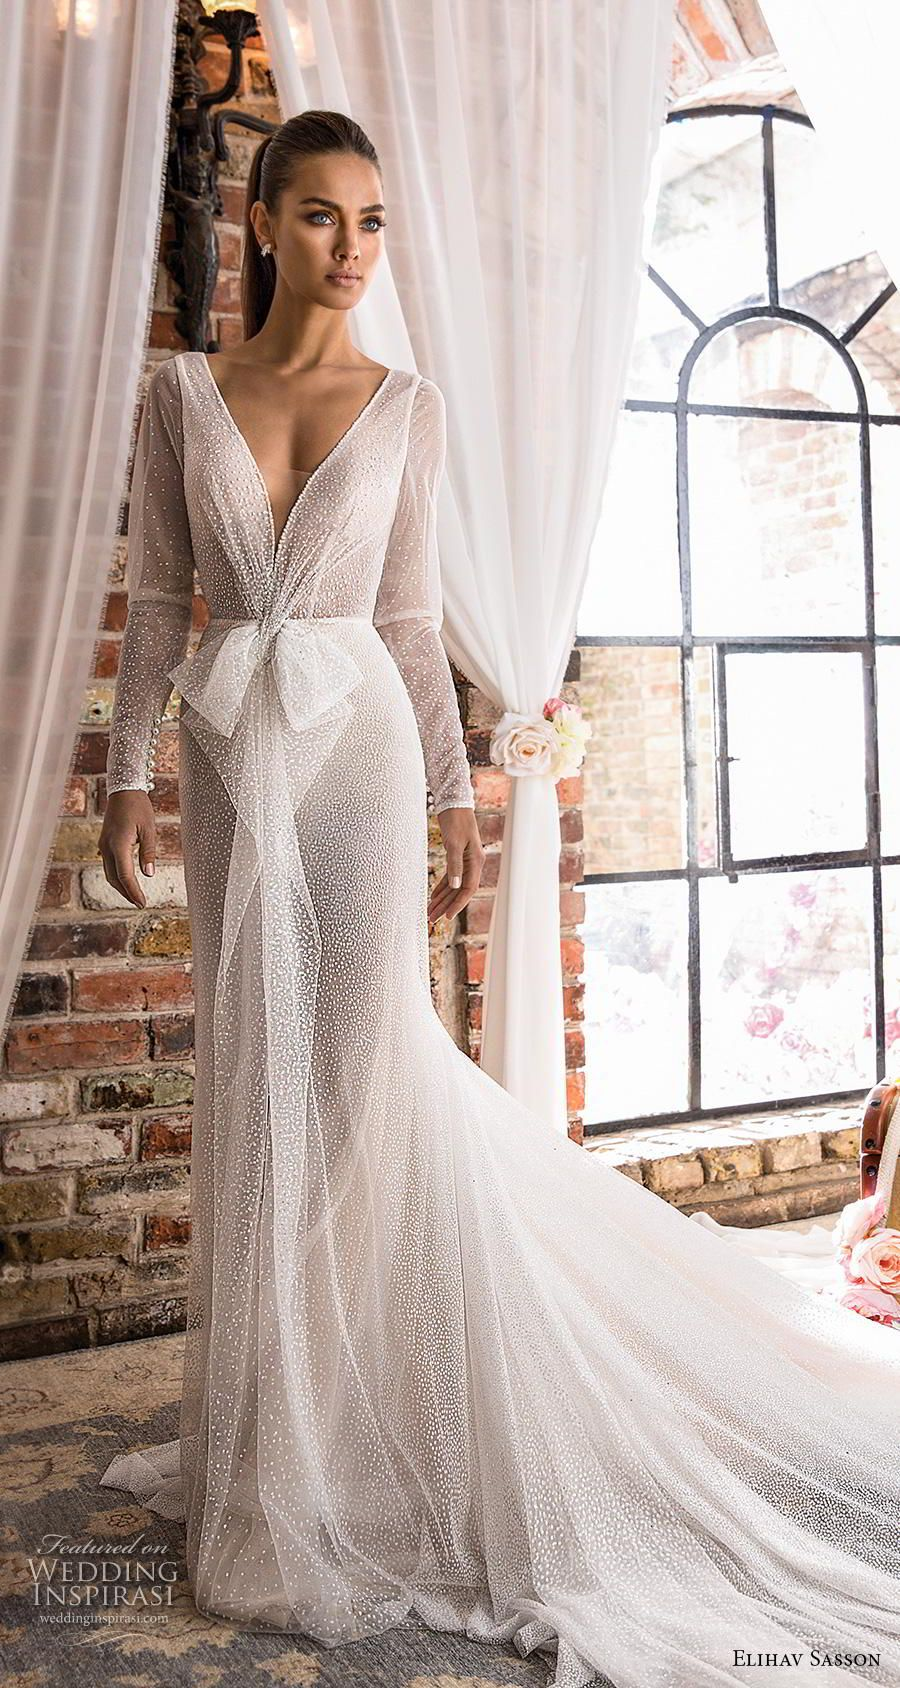 Elihav Sasson 2019 Bridal Long Sleeves Deep V Neck Full Embellishment Glitzy Elegant Sheath Wedding D Wedding Dresses Wedding Dresses Lace V Neck Wedding Dress [ 1688 x 900 Pixel ]